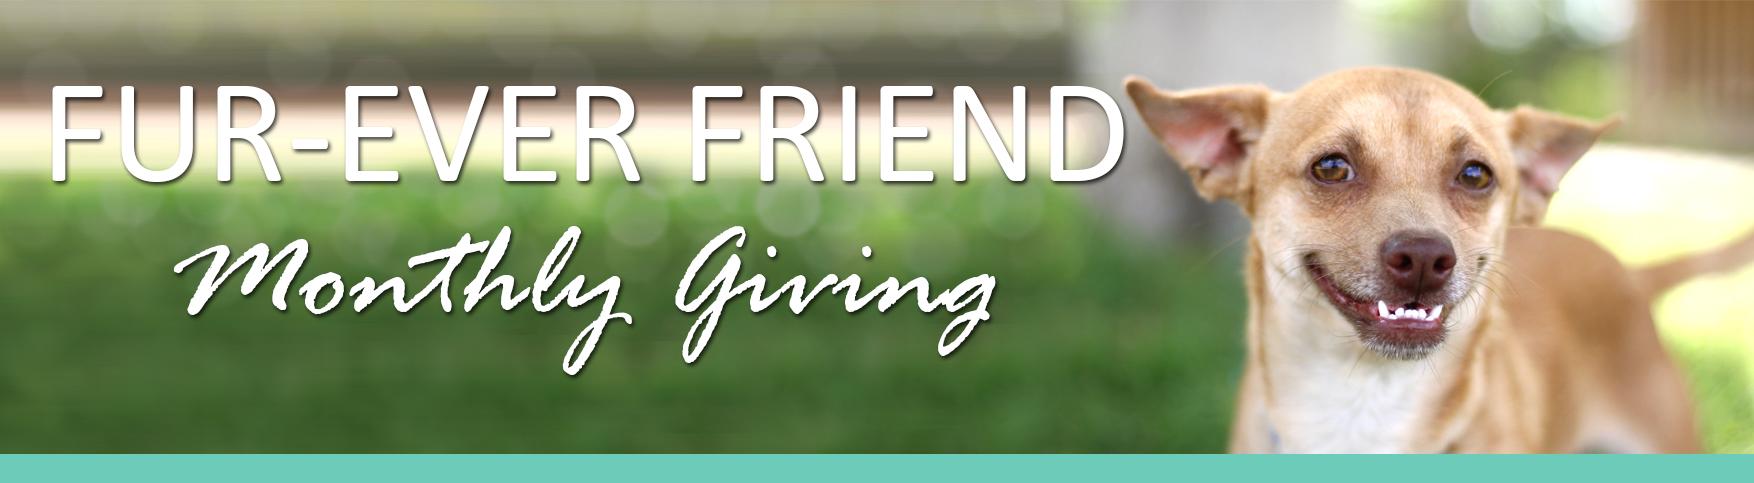 Fur-ever Friend banner